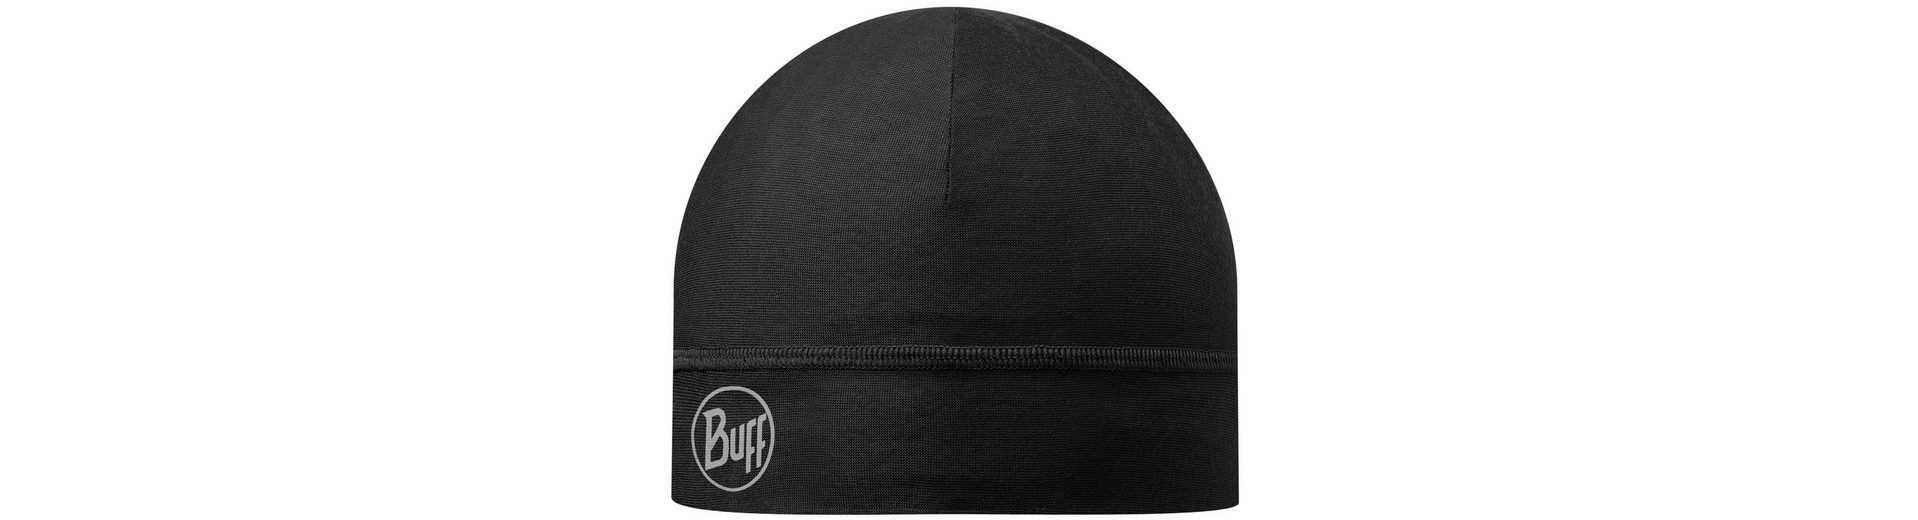 BUFF® Mütze, »Microfiber 1 Layer Hat Buff«